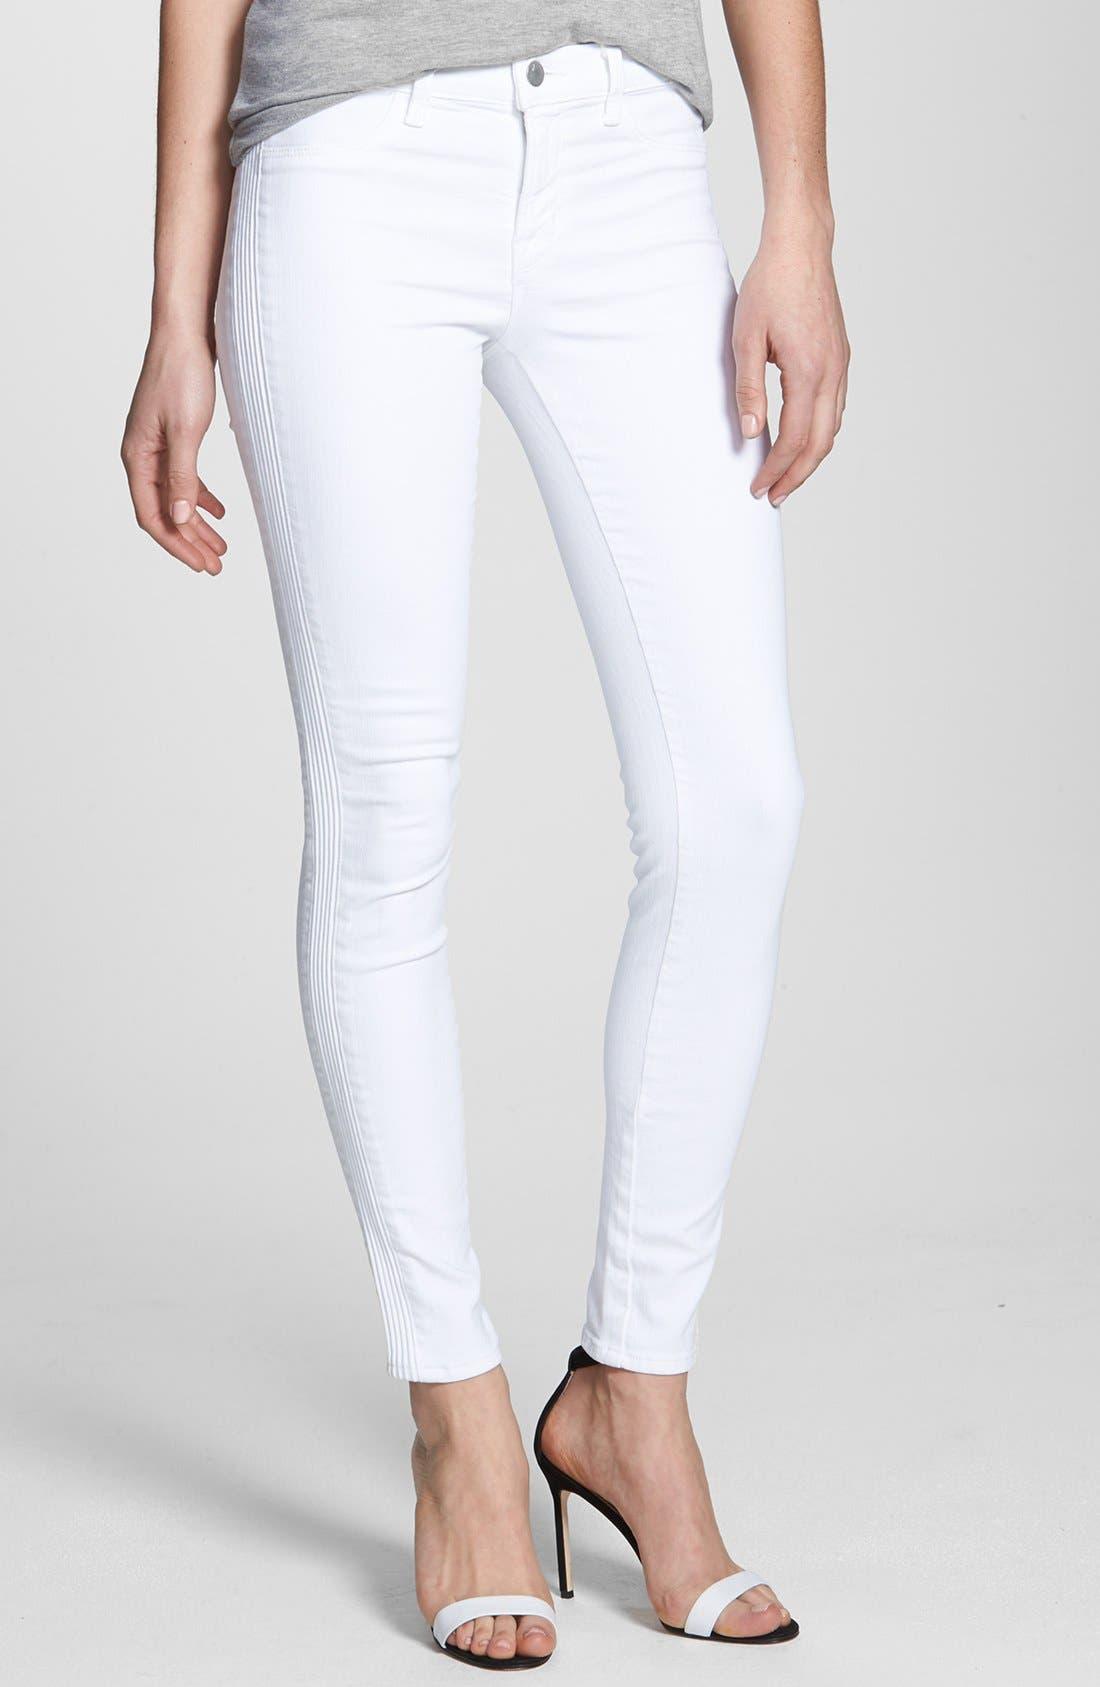 Main Image - J Brand Mid Rise Skinny Jeans (Blanc)